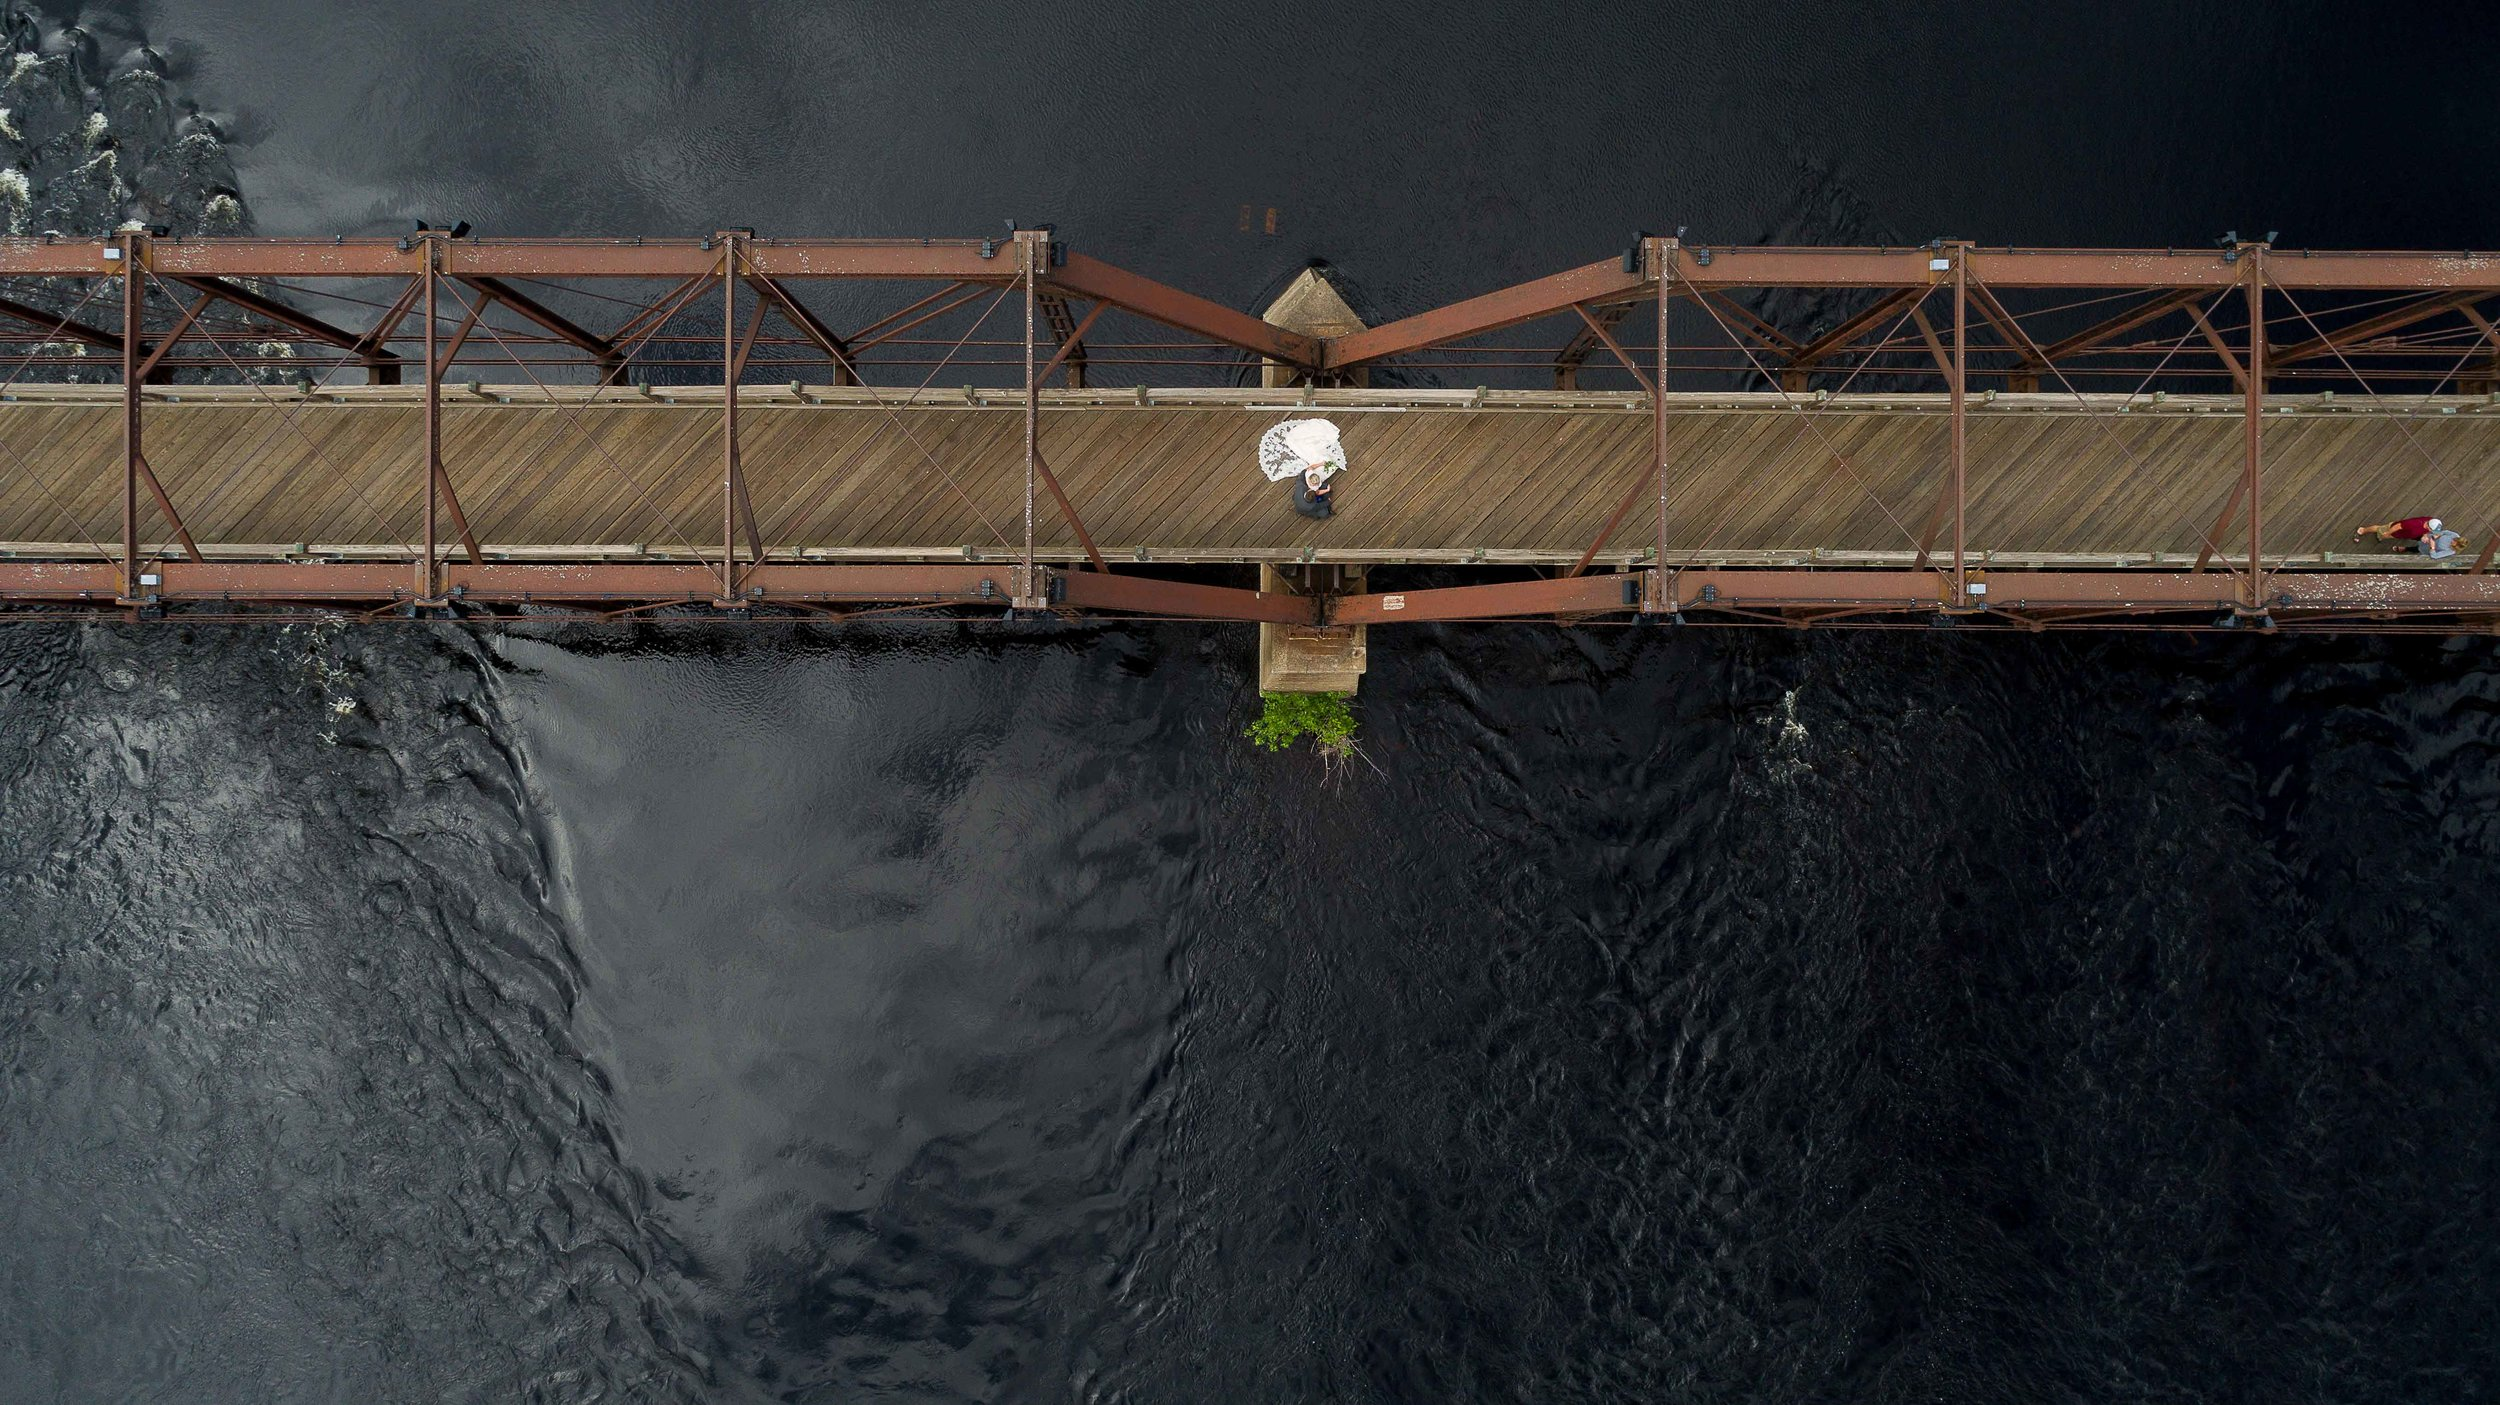 Drone photos-15.jpg